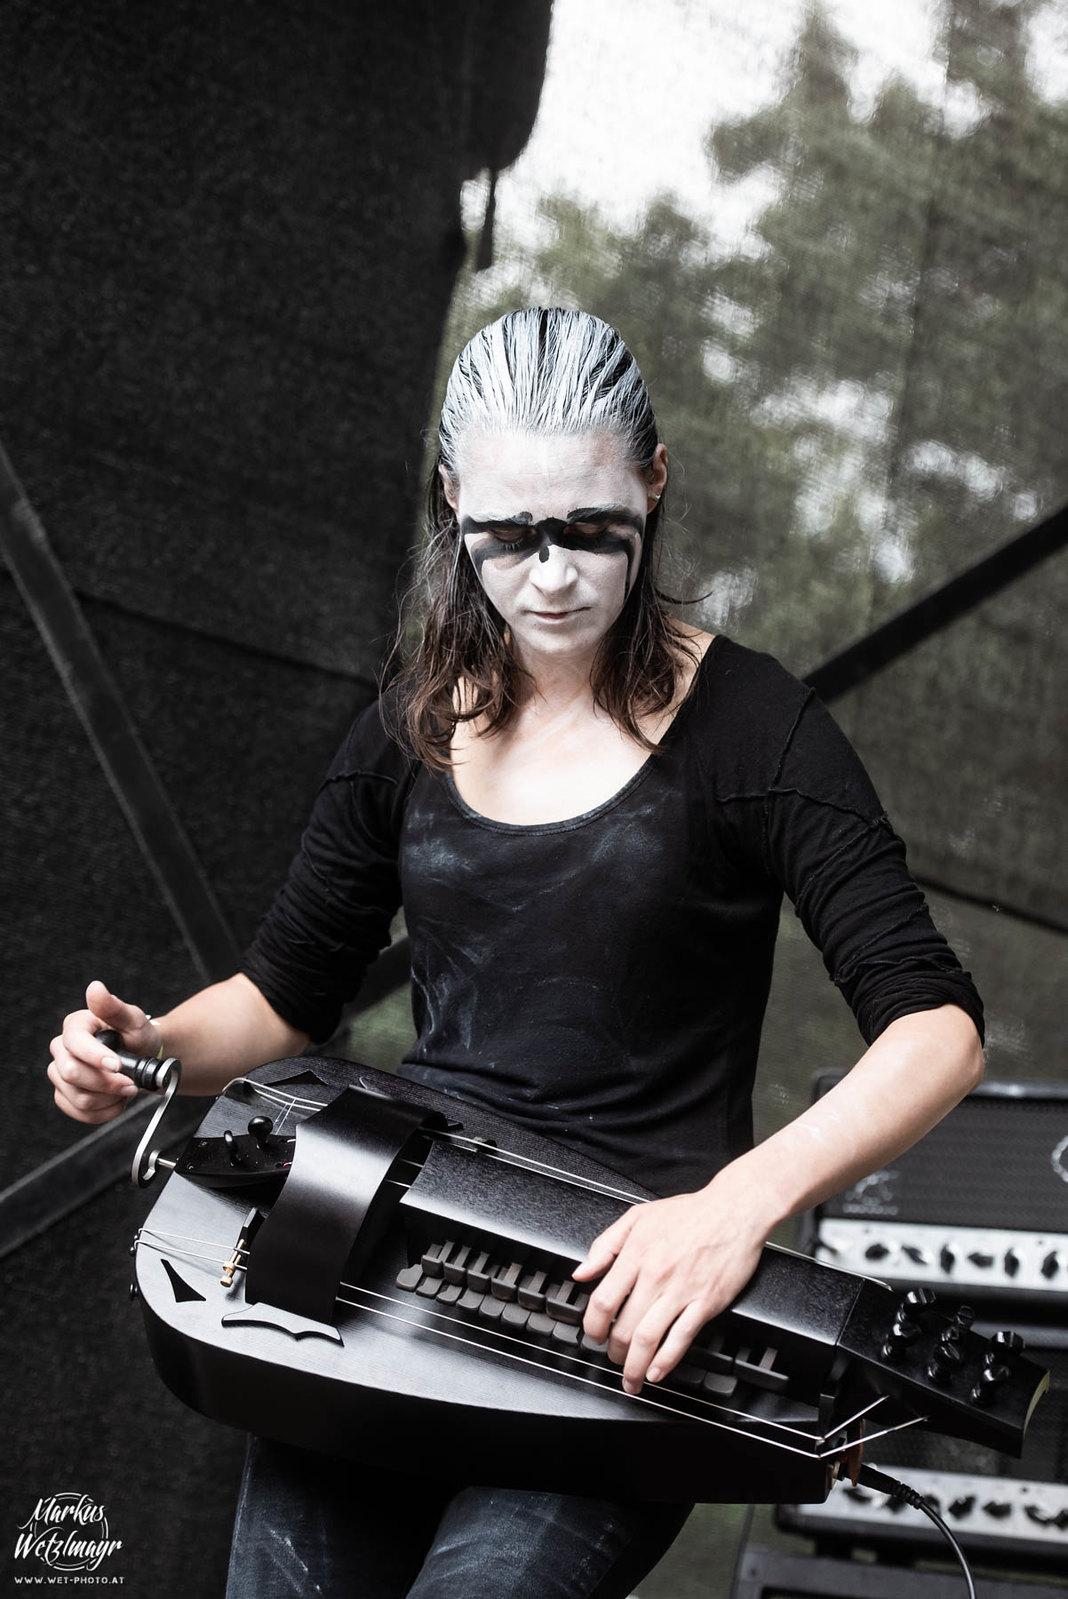 ALPHAYN - Metalheads Against Racism Vol. 8, Donauinselfest Vienna